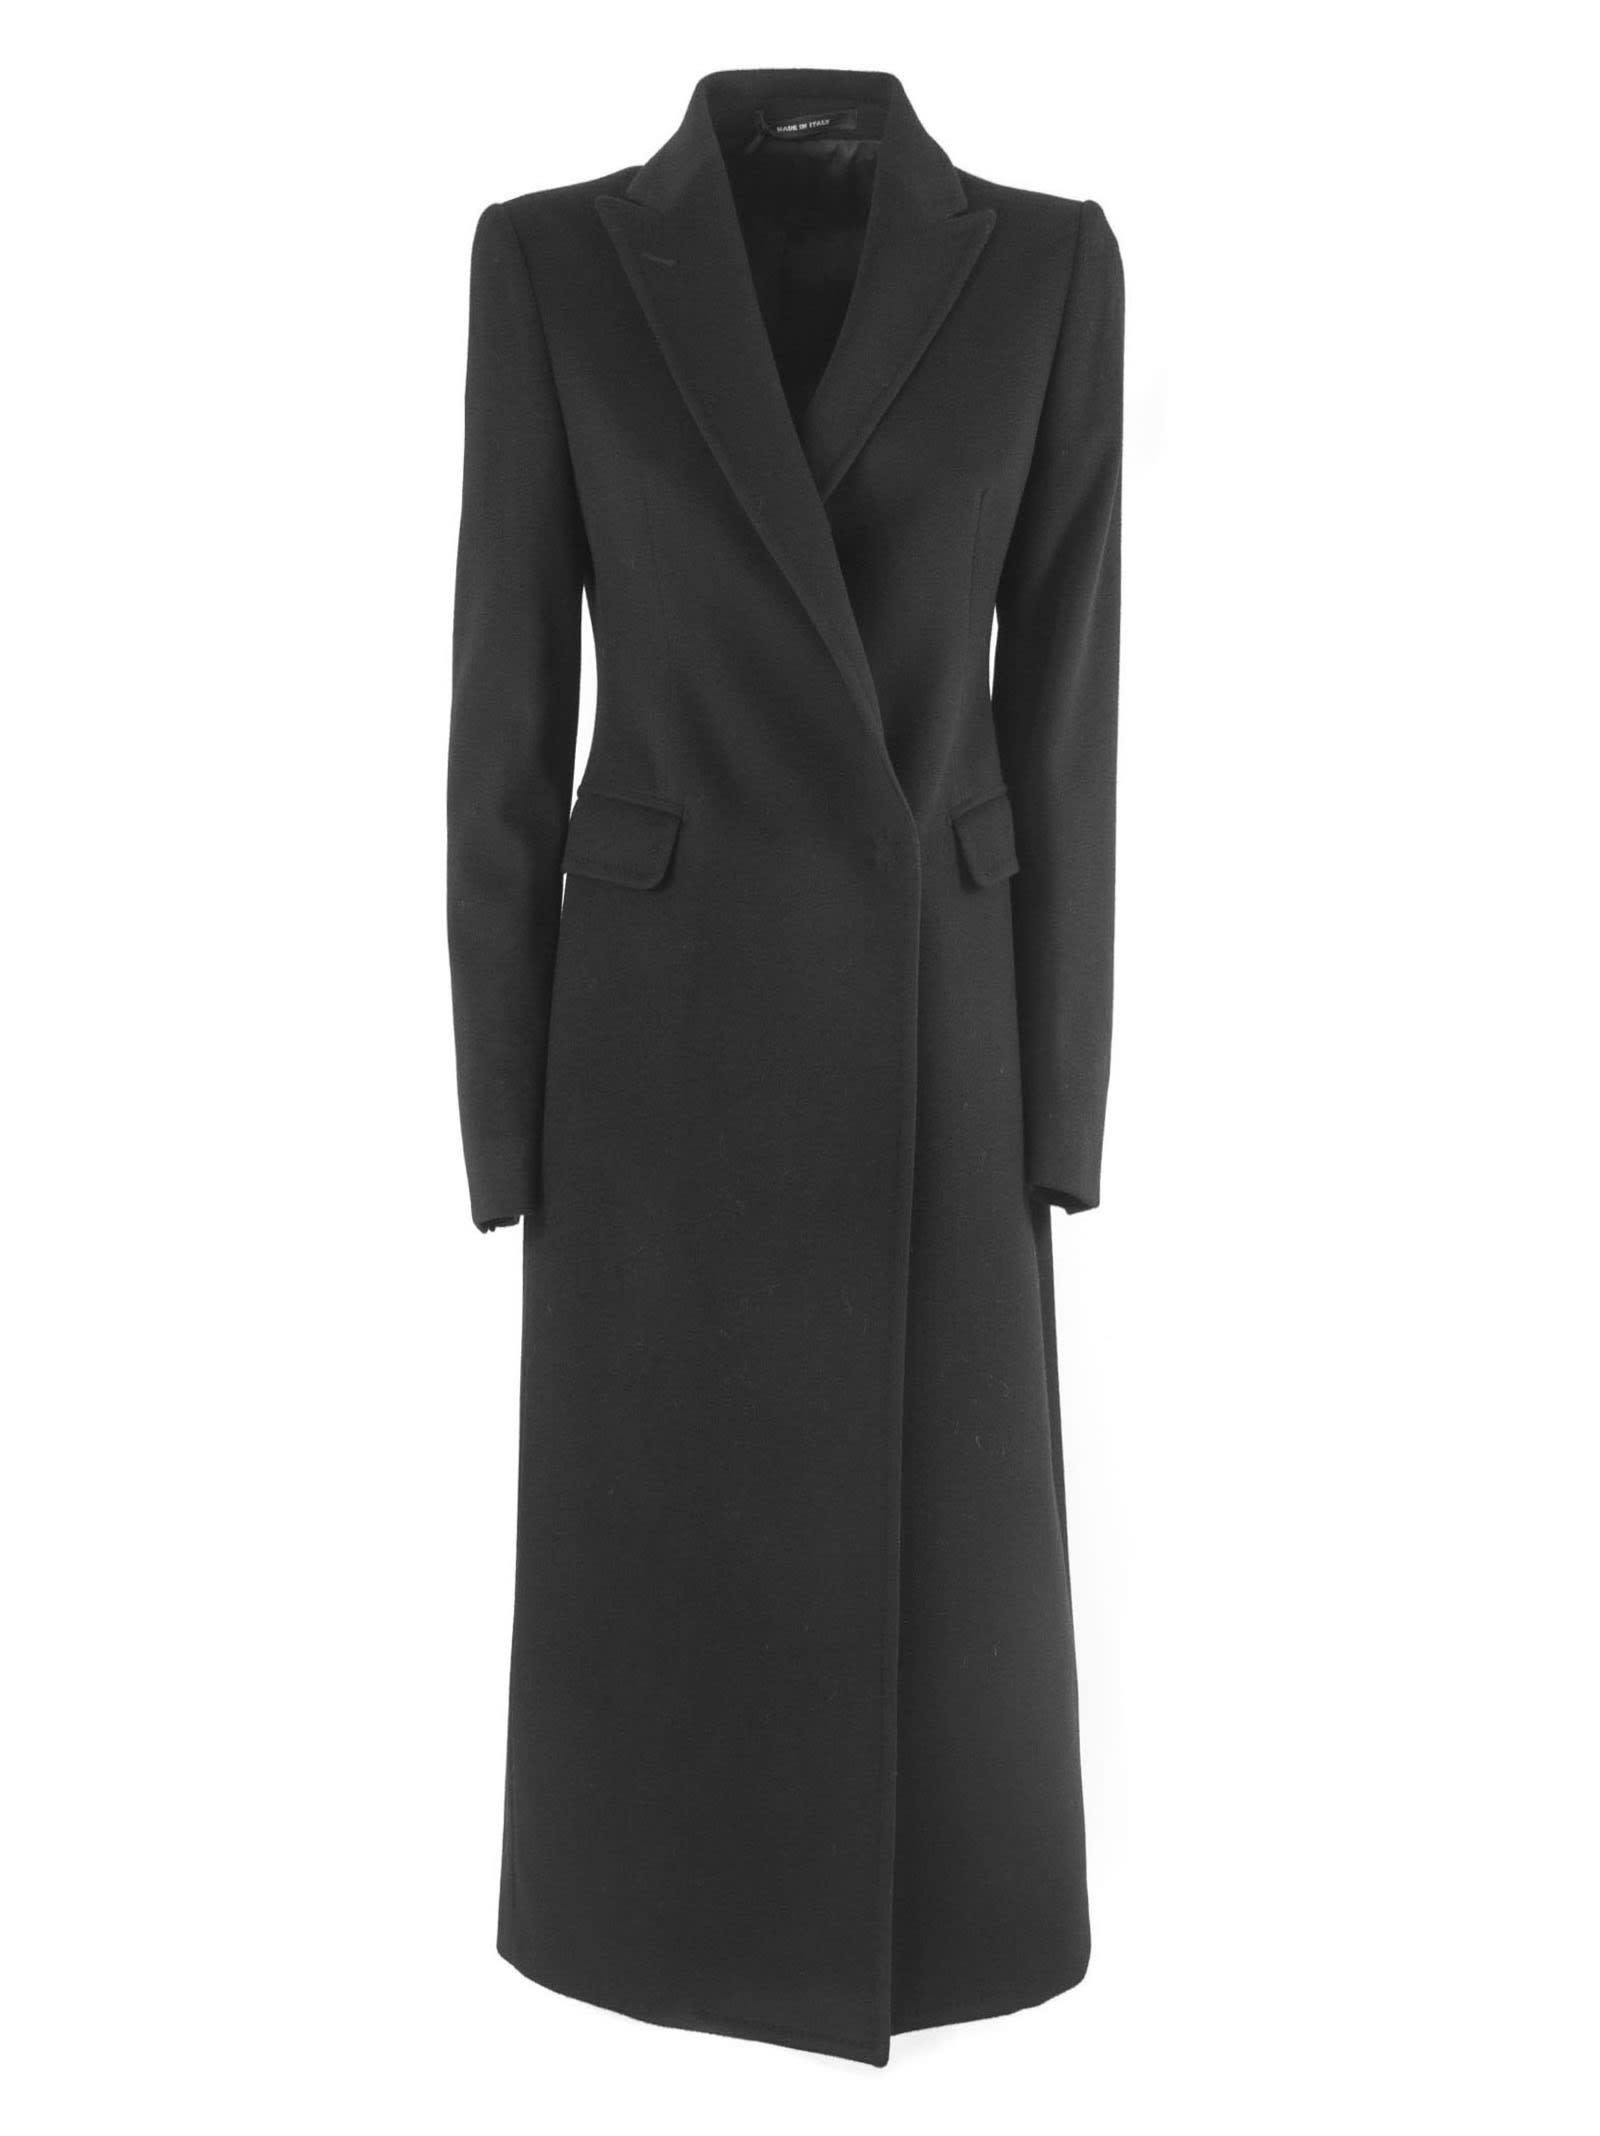 Tagliatore Long Coat In Black Wool And Cashmere